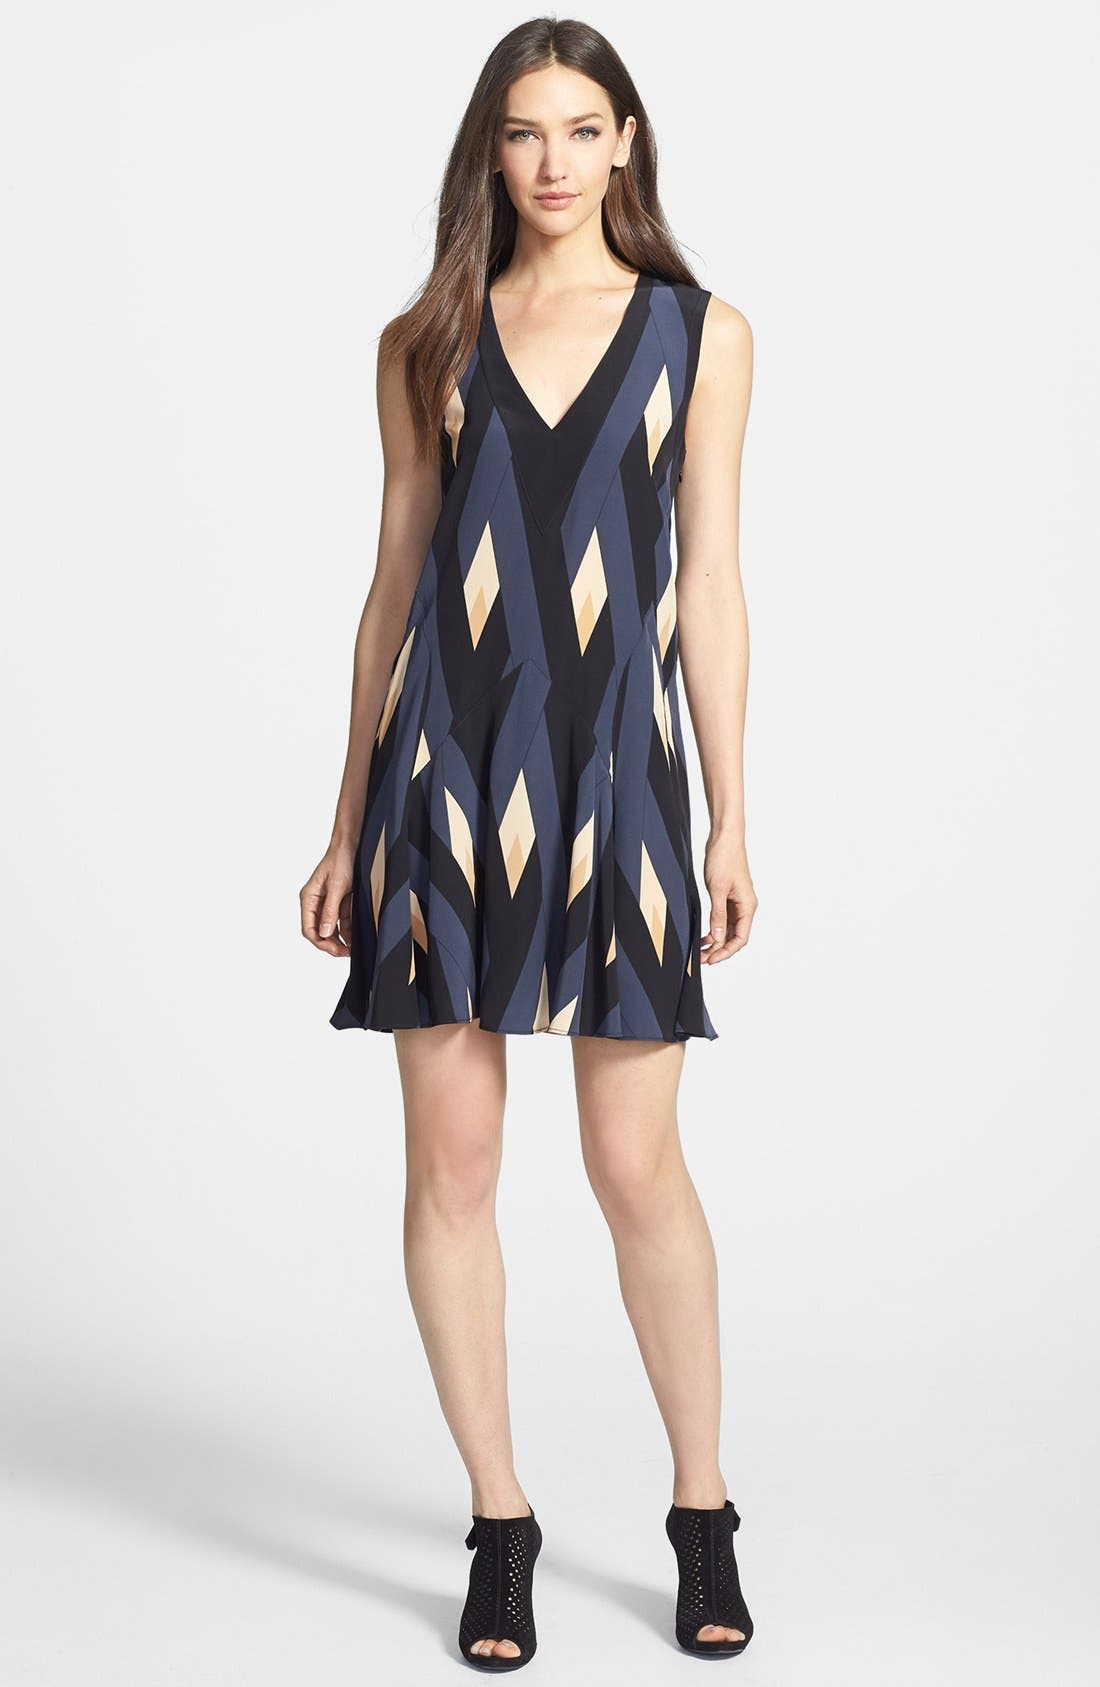 Main Image - MARC BY MARC JACOBS 'Diamond Flame' Silk A-Line Dress